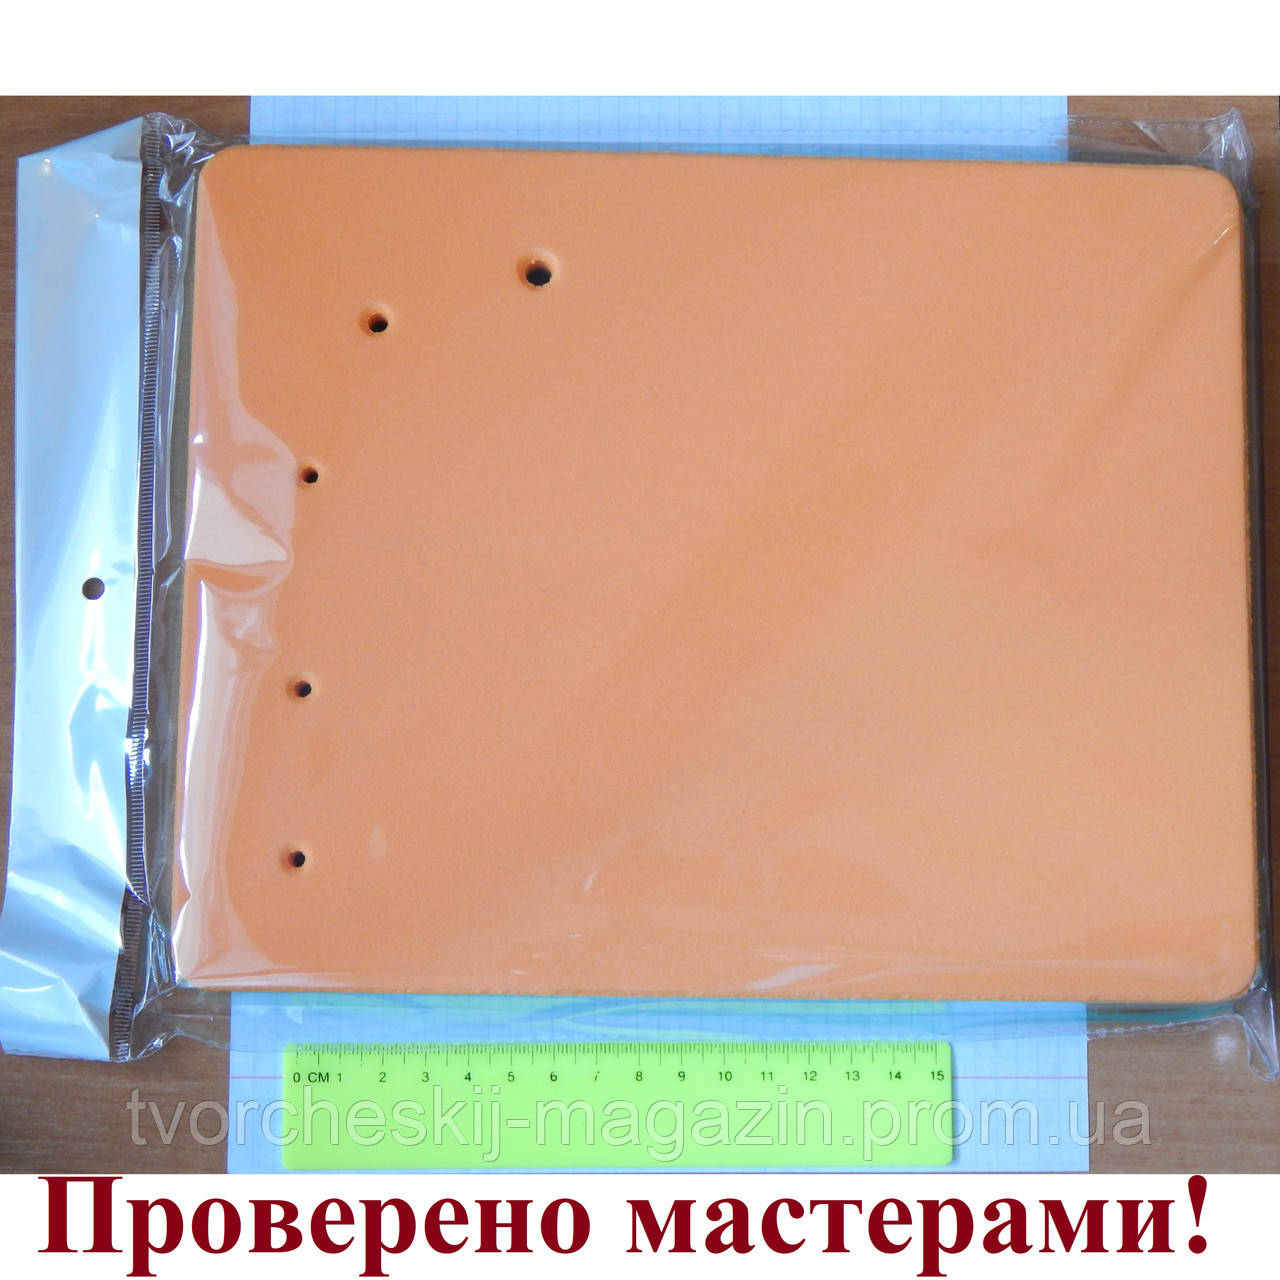 Коврик для лепки цветов 25*20 см